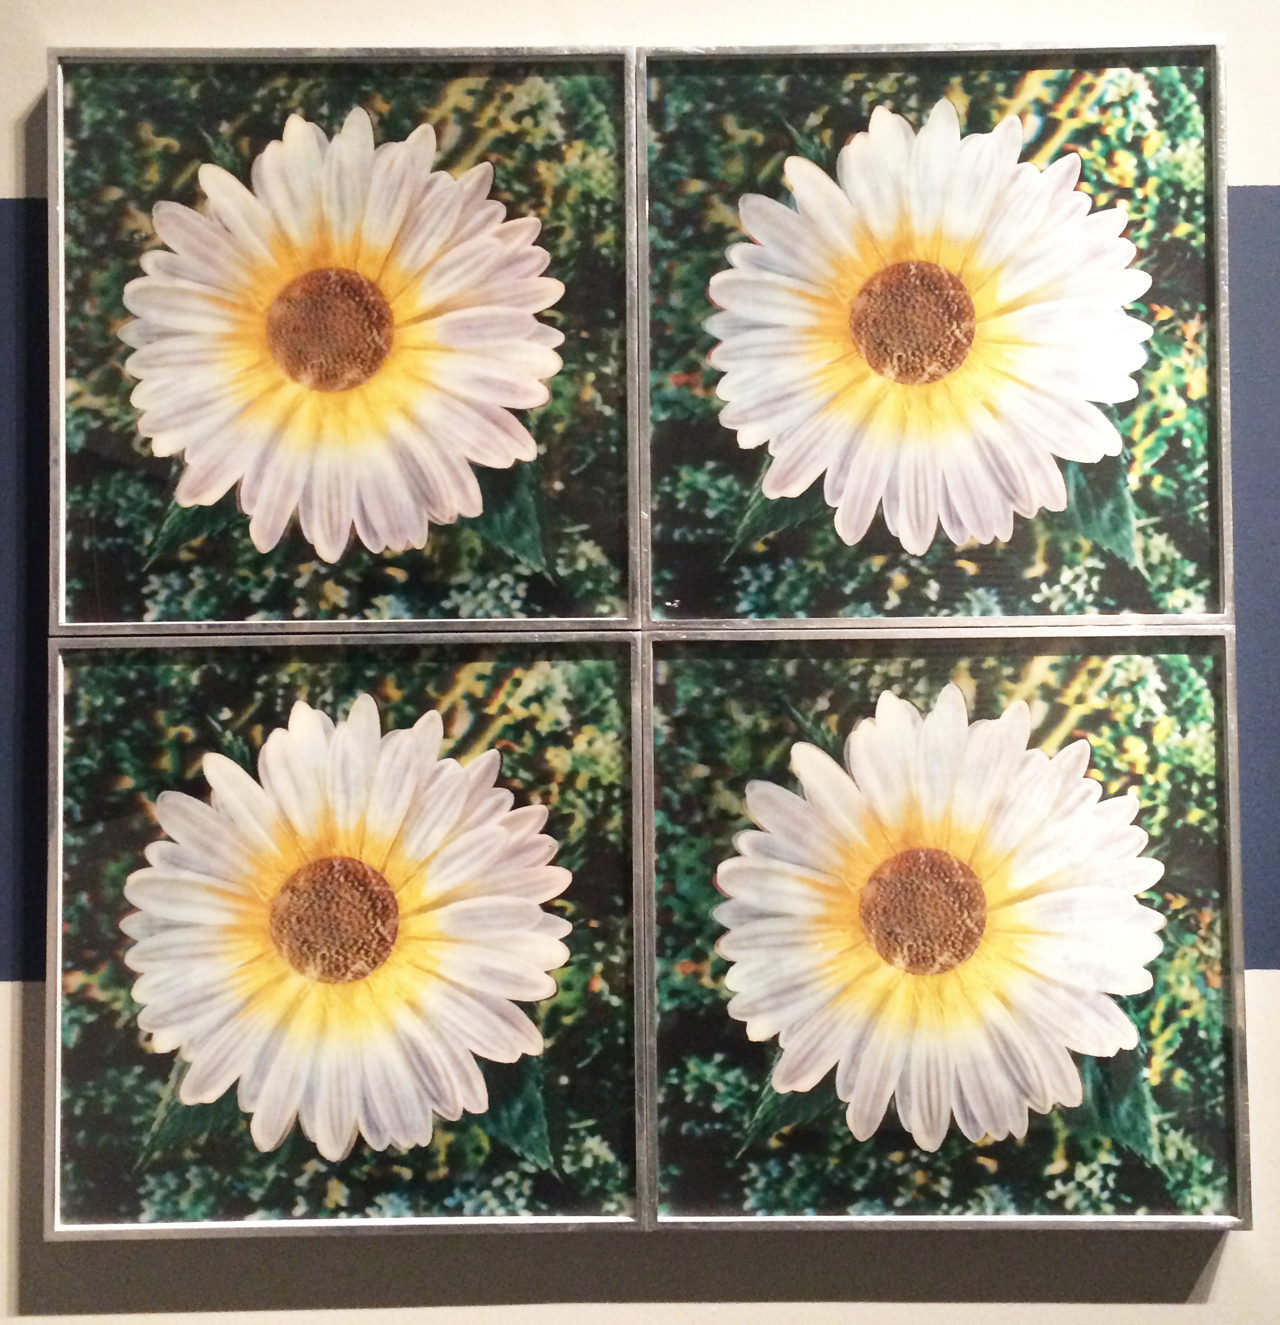 A&T_Warhol daisies